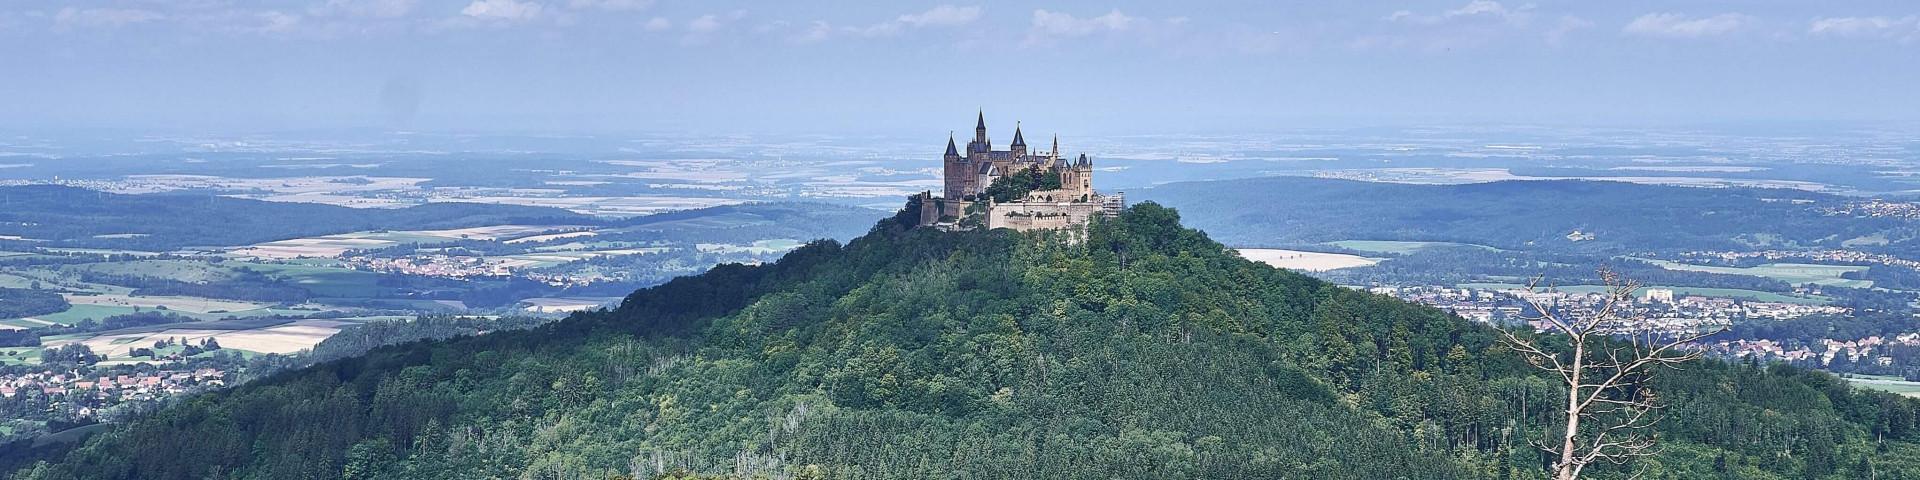 Hohenzollern Castle (Burg Hohenzollern); vacation i nthe Swabian Alb